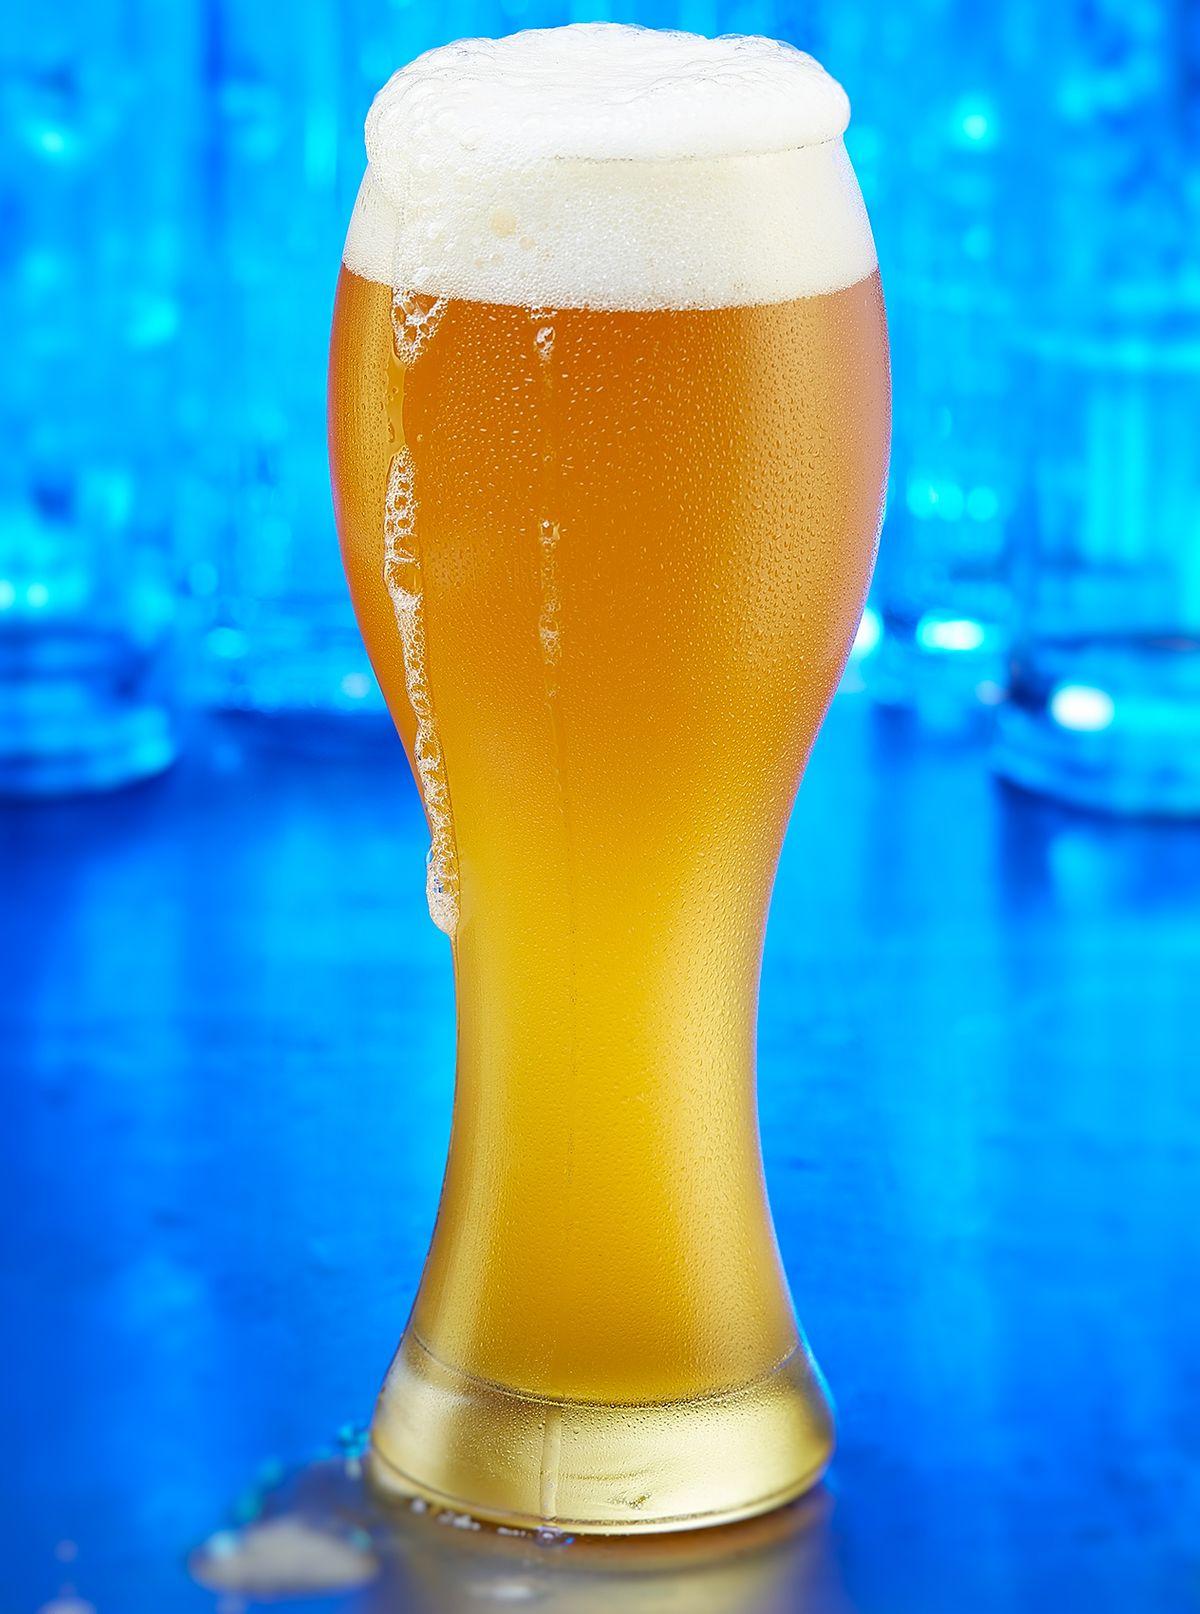 Beer_blue_glasses.jpg